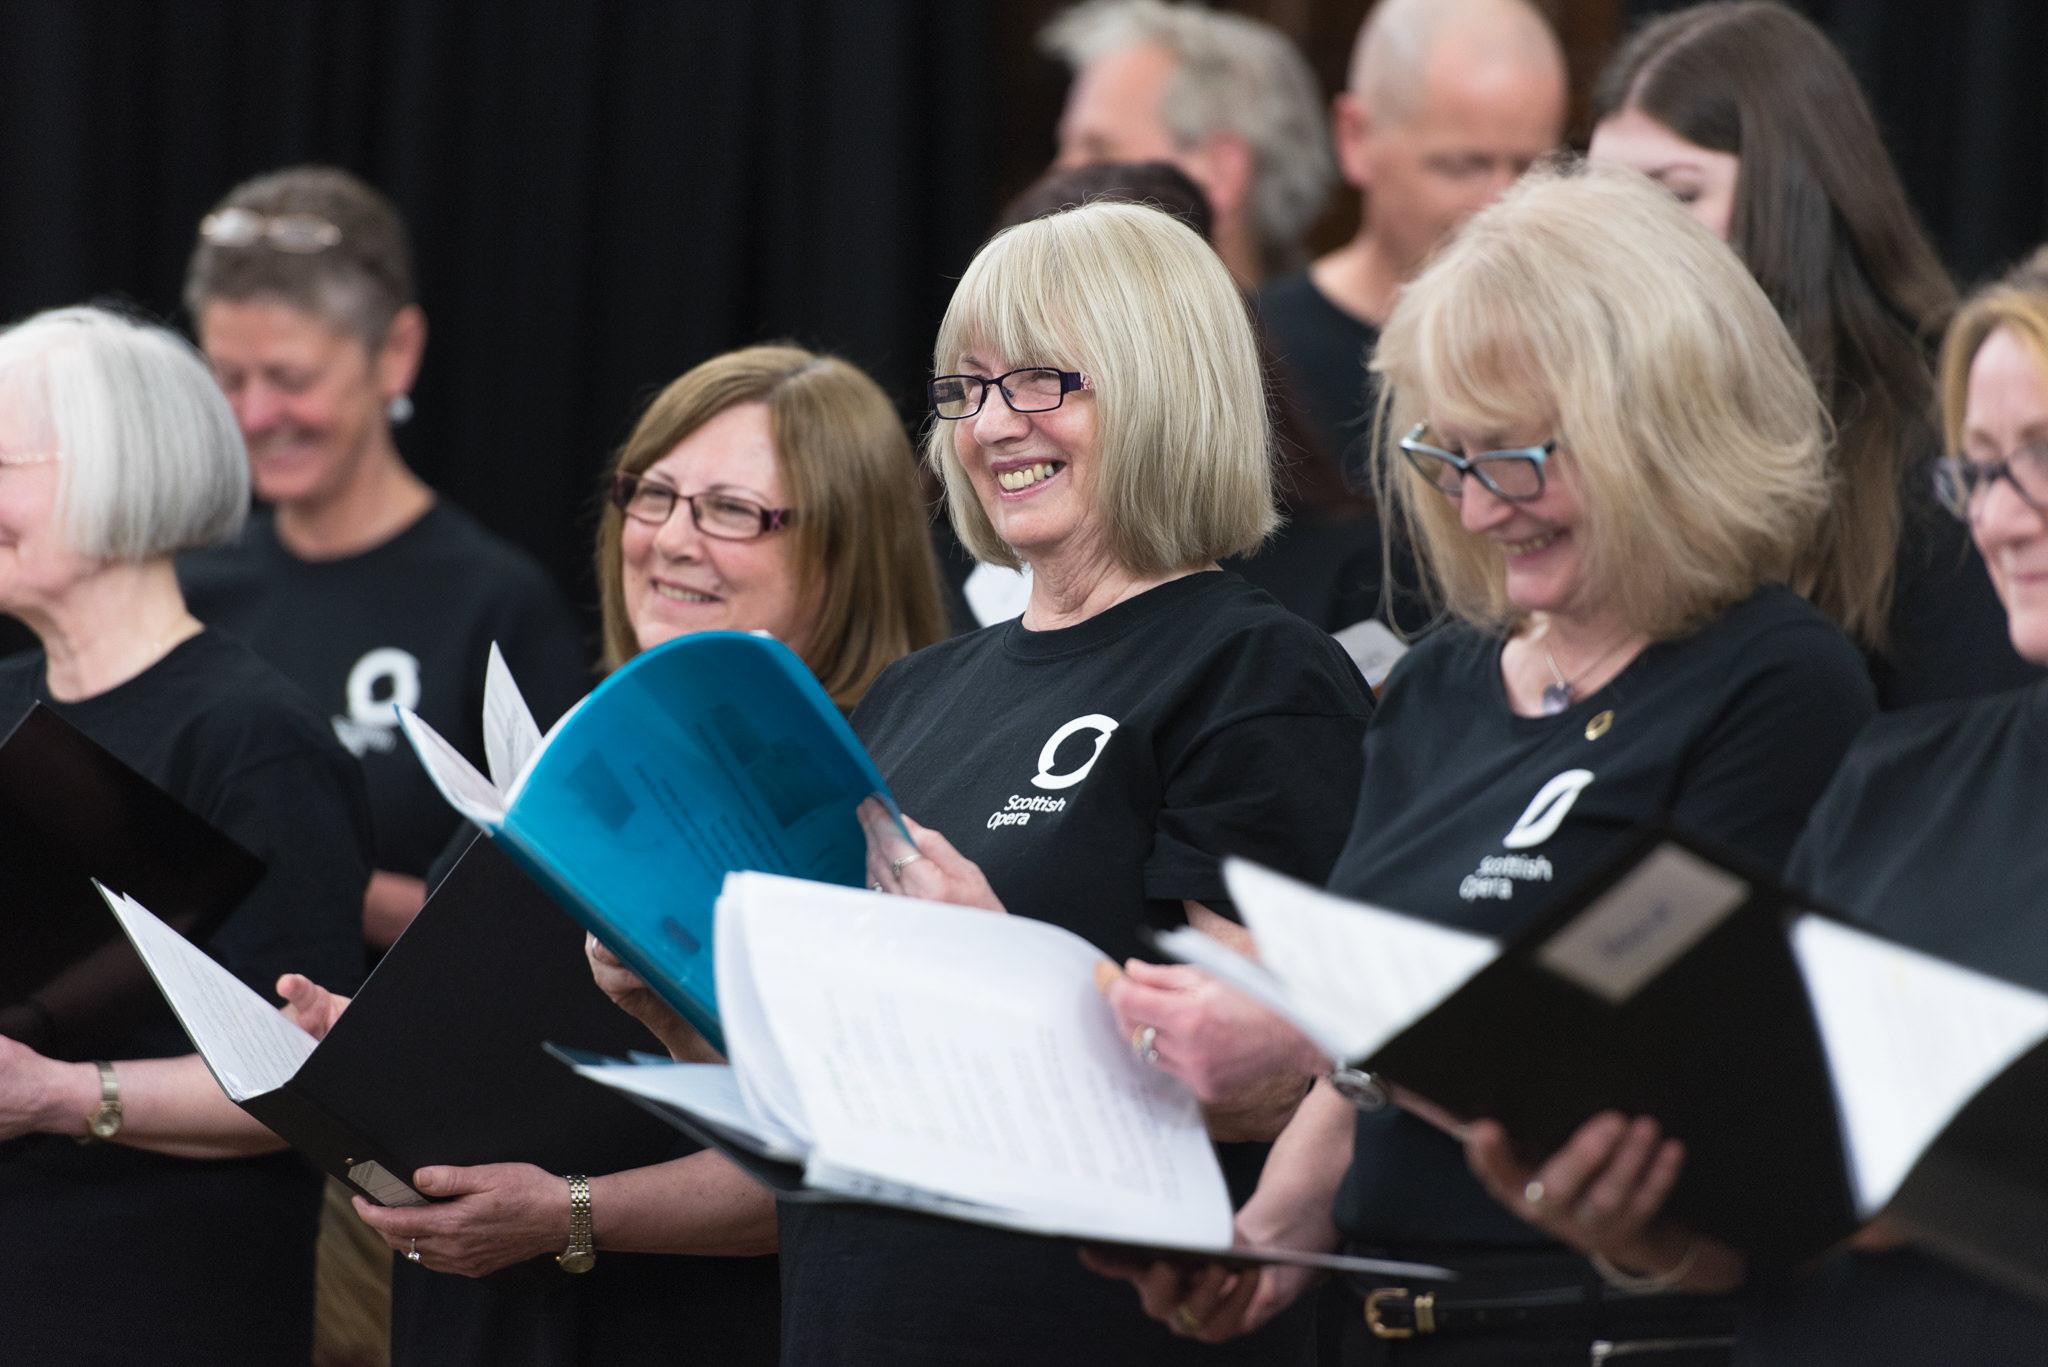 scottish-opera-community-choir-089-web.jpg